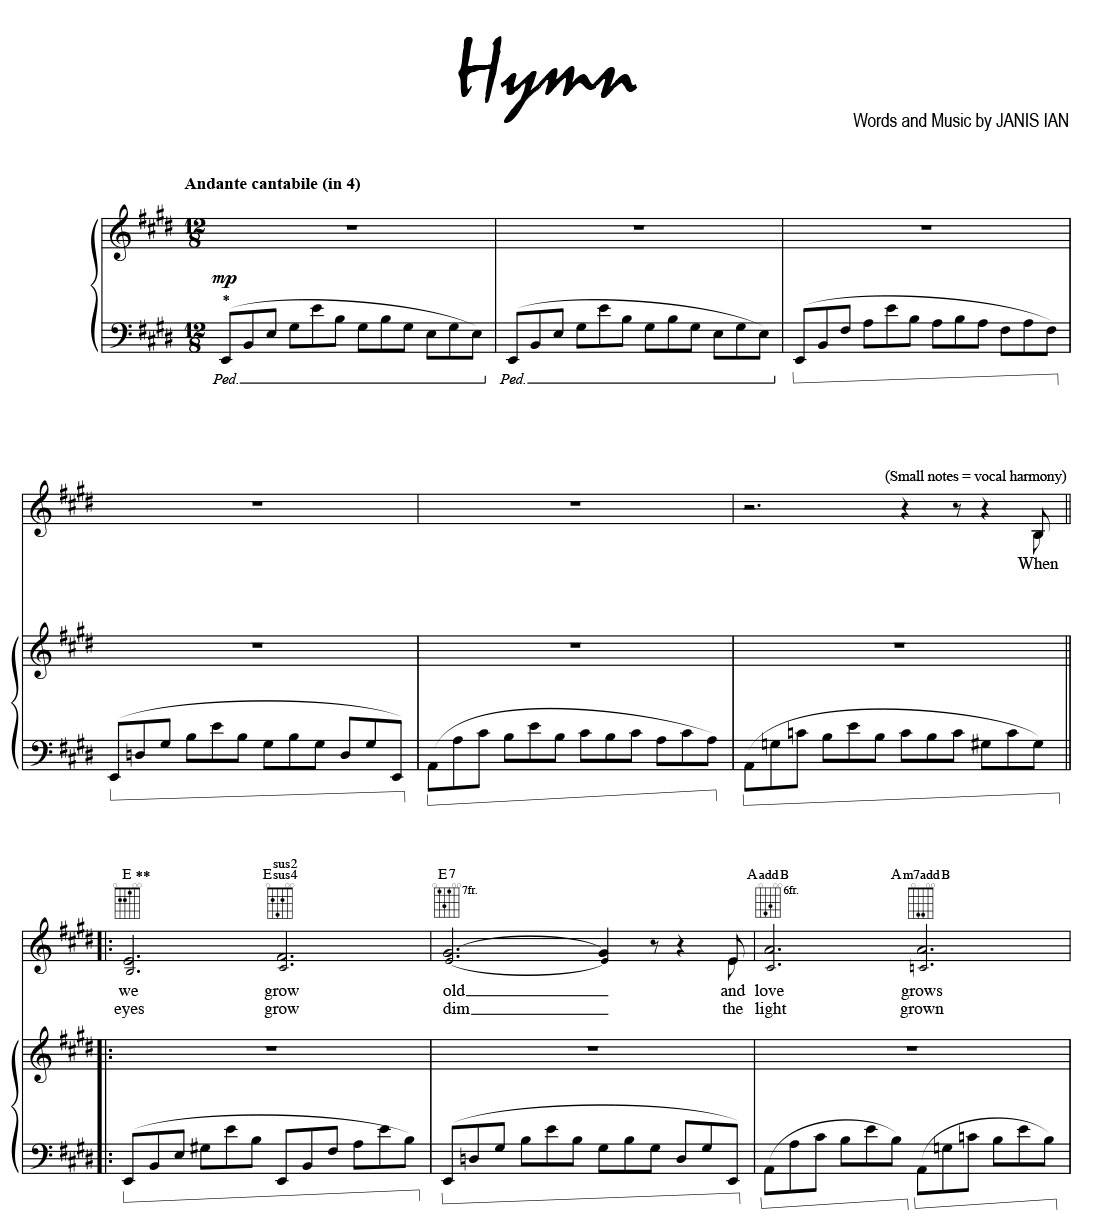 Hymn - Sheet Music